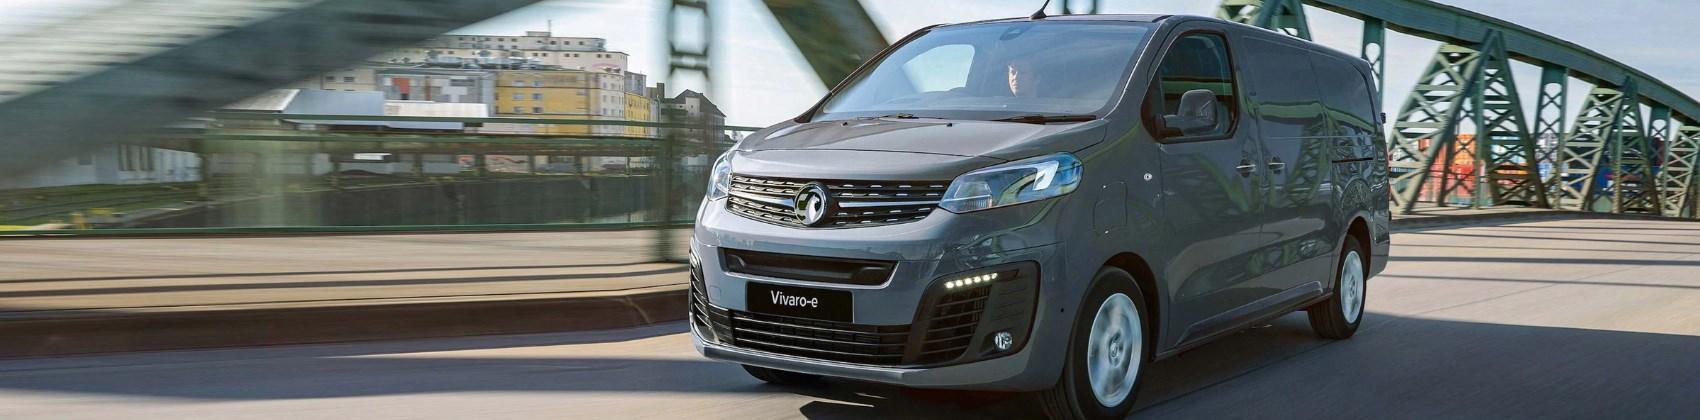 The new all-electric Vauxhall Vivaro-e